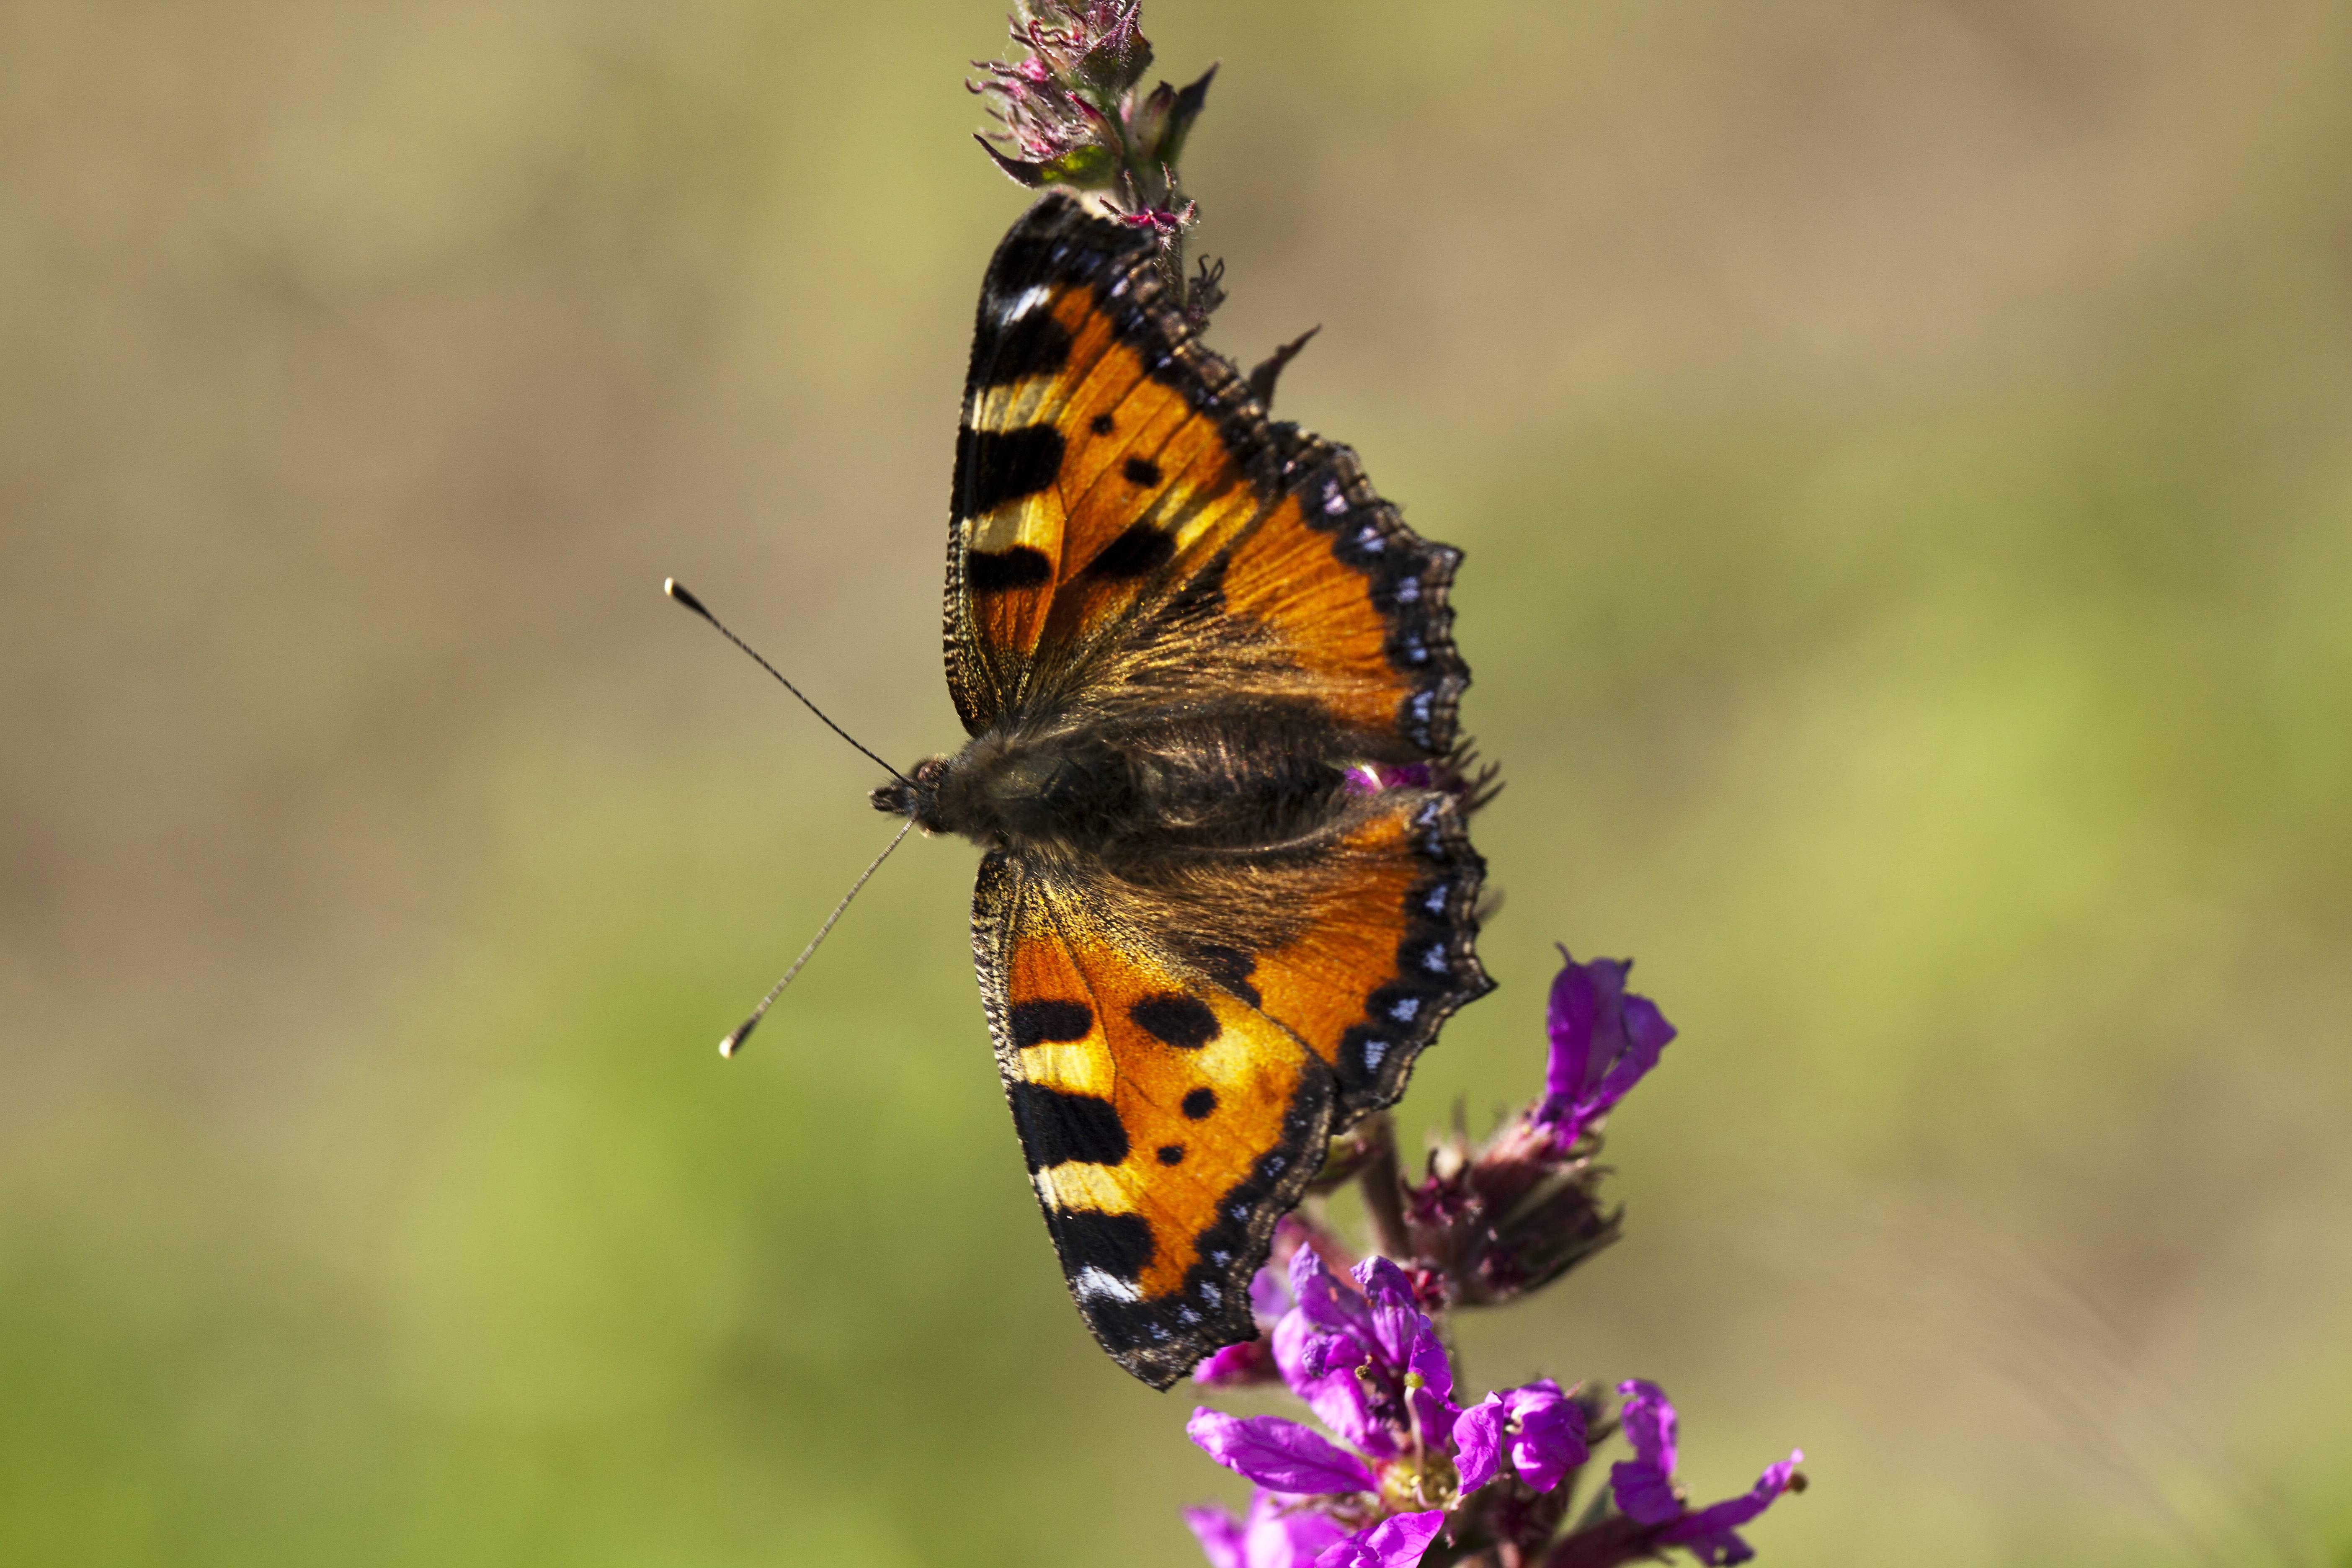 Hoeveel vlinders tel jij in je tuin?